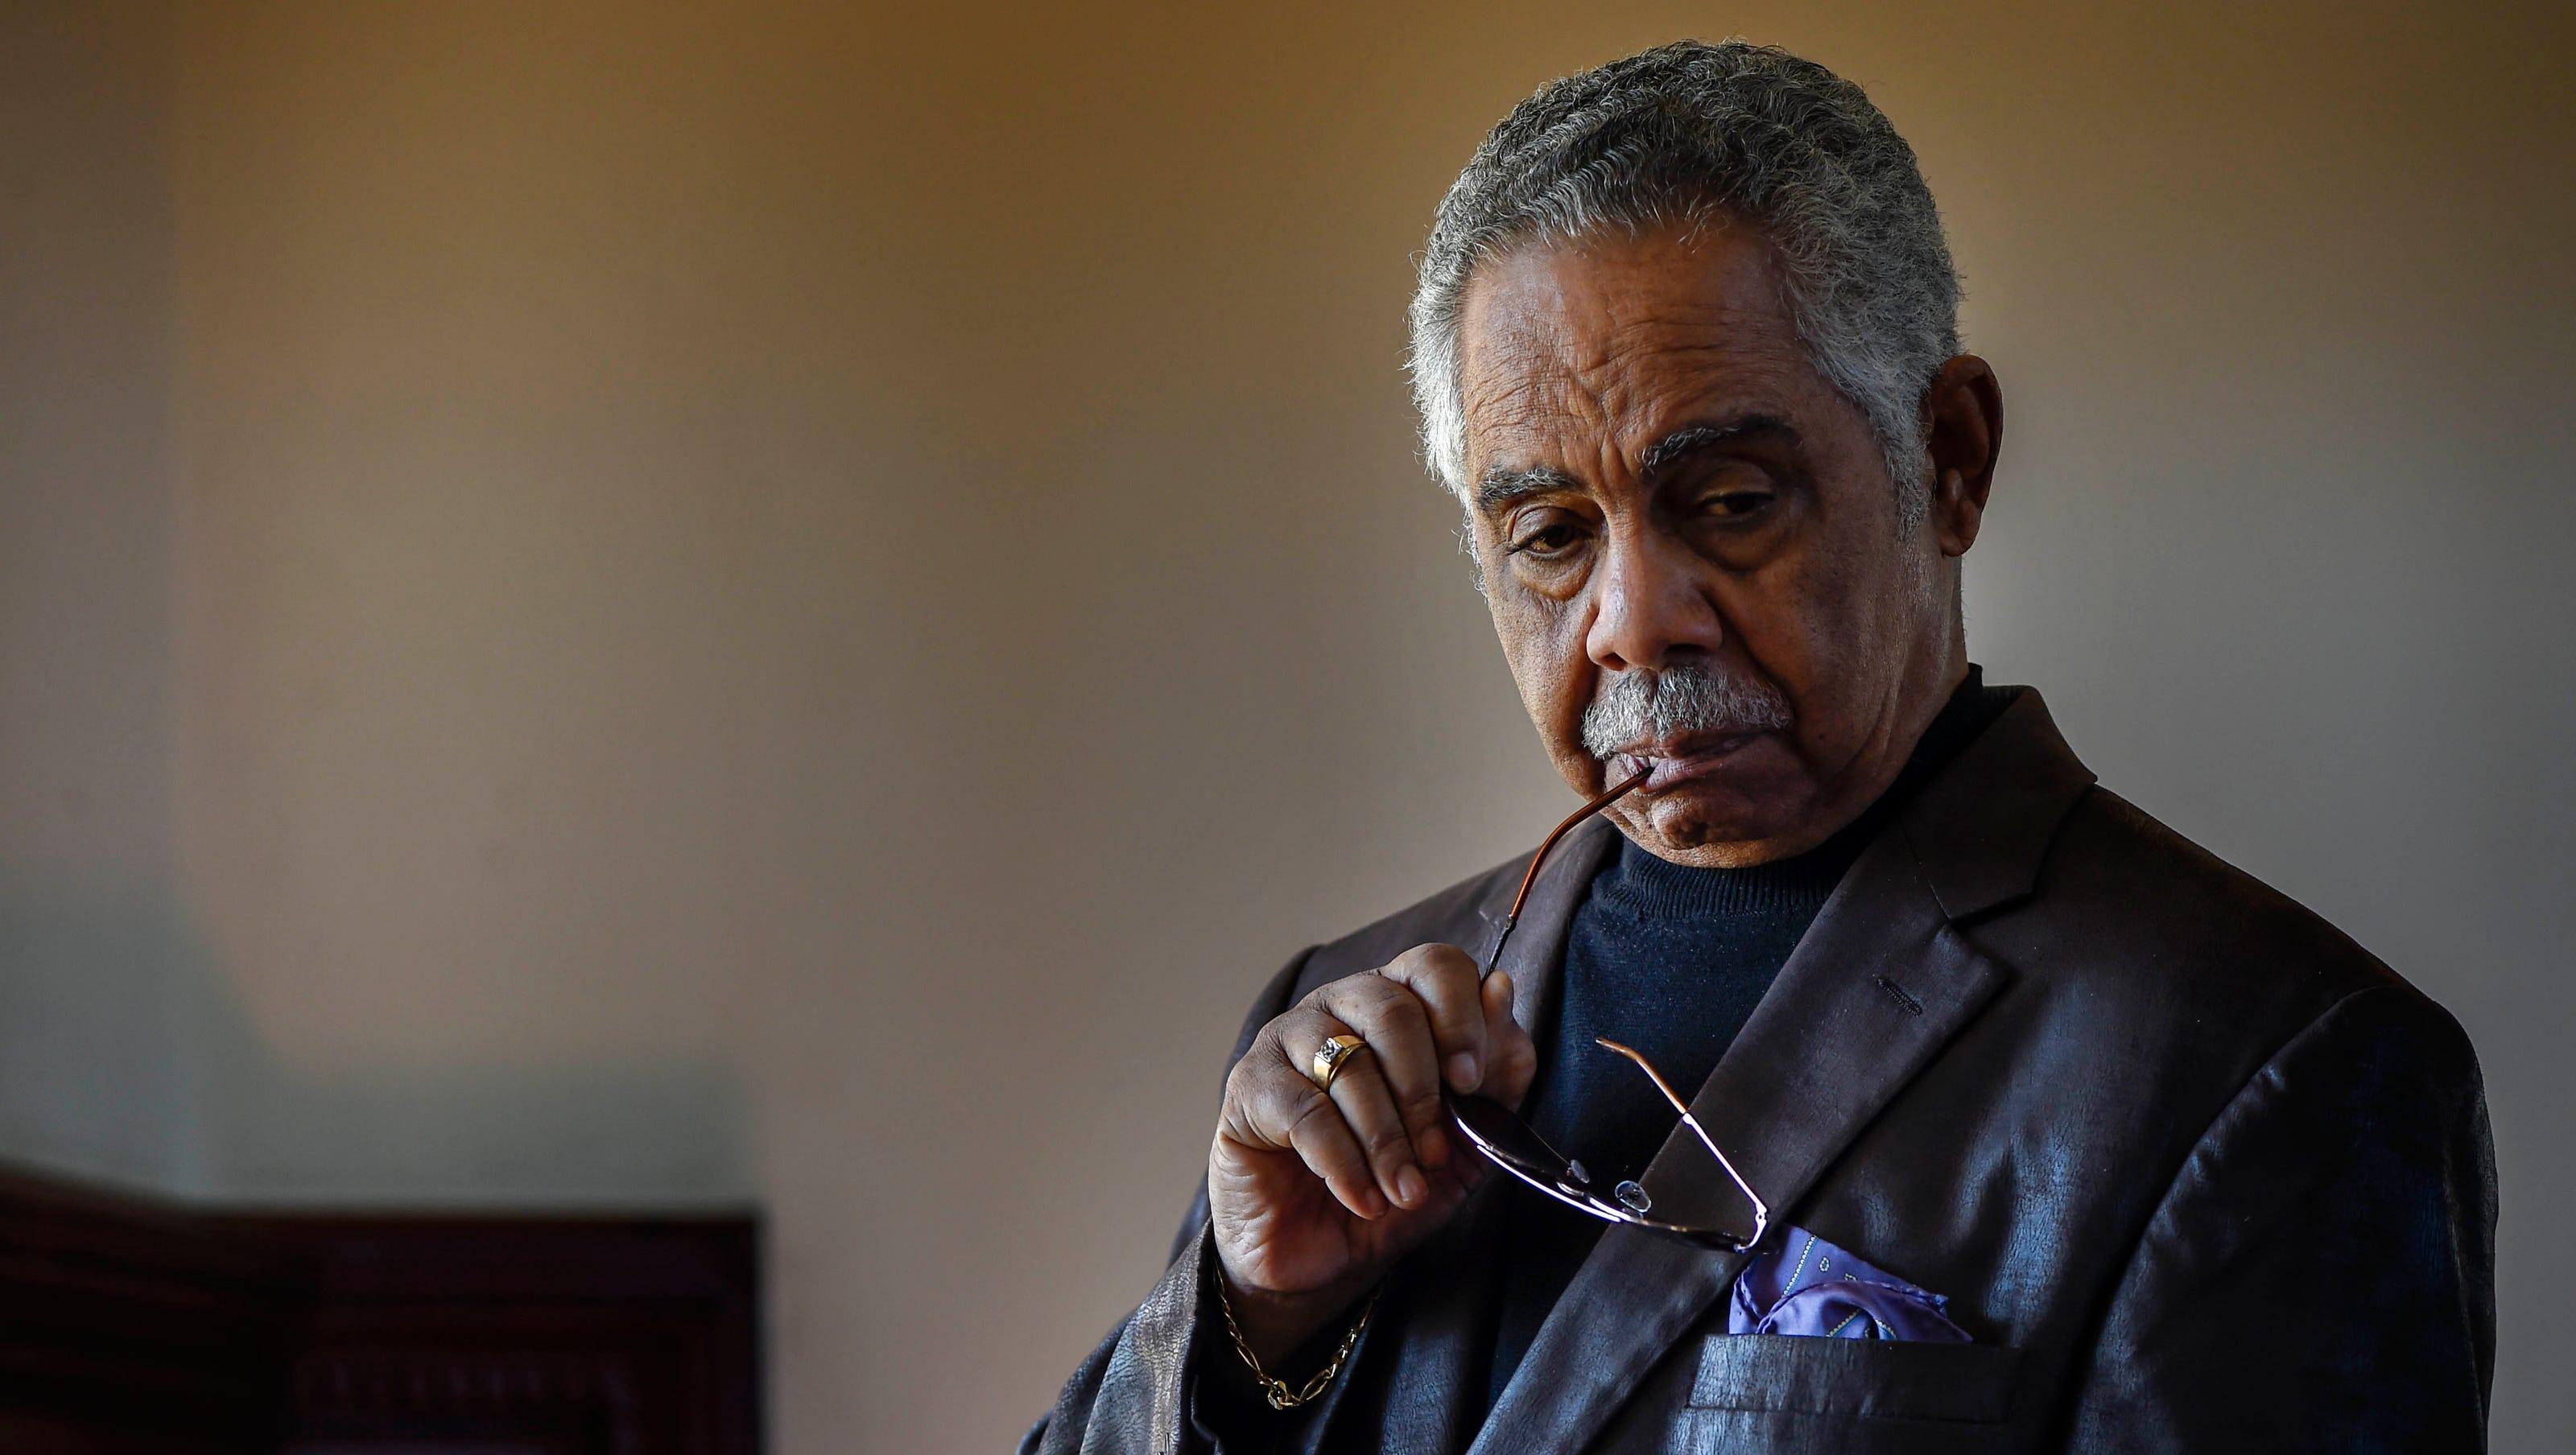 Reavis Mitchell, Nashville historian and Fisk professor, dies at 72